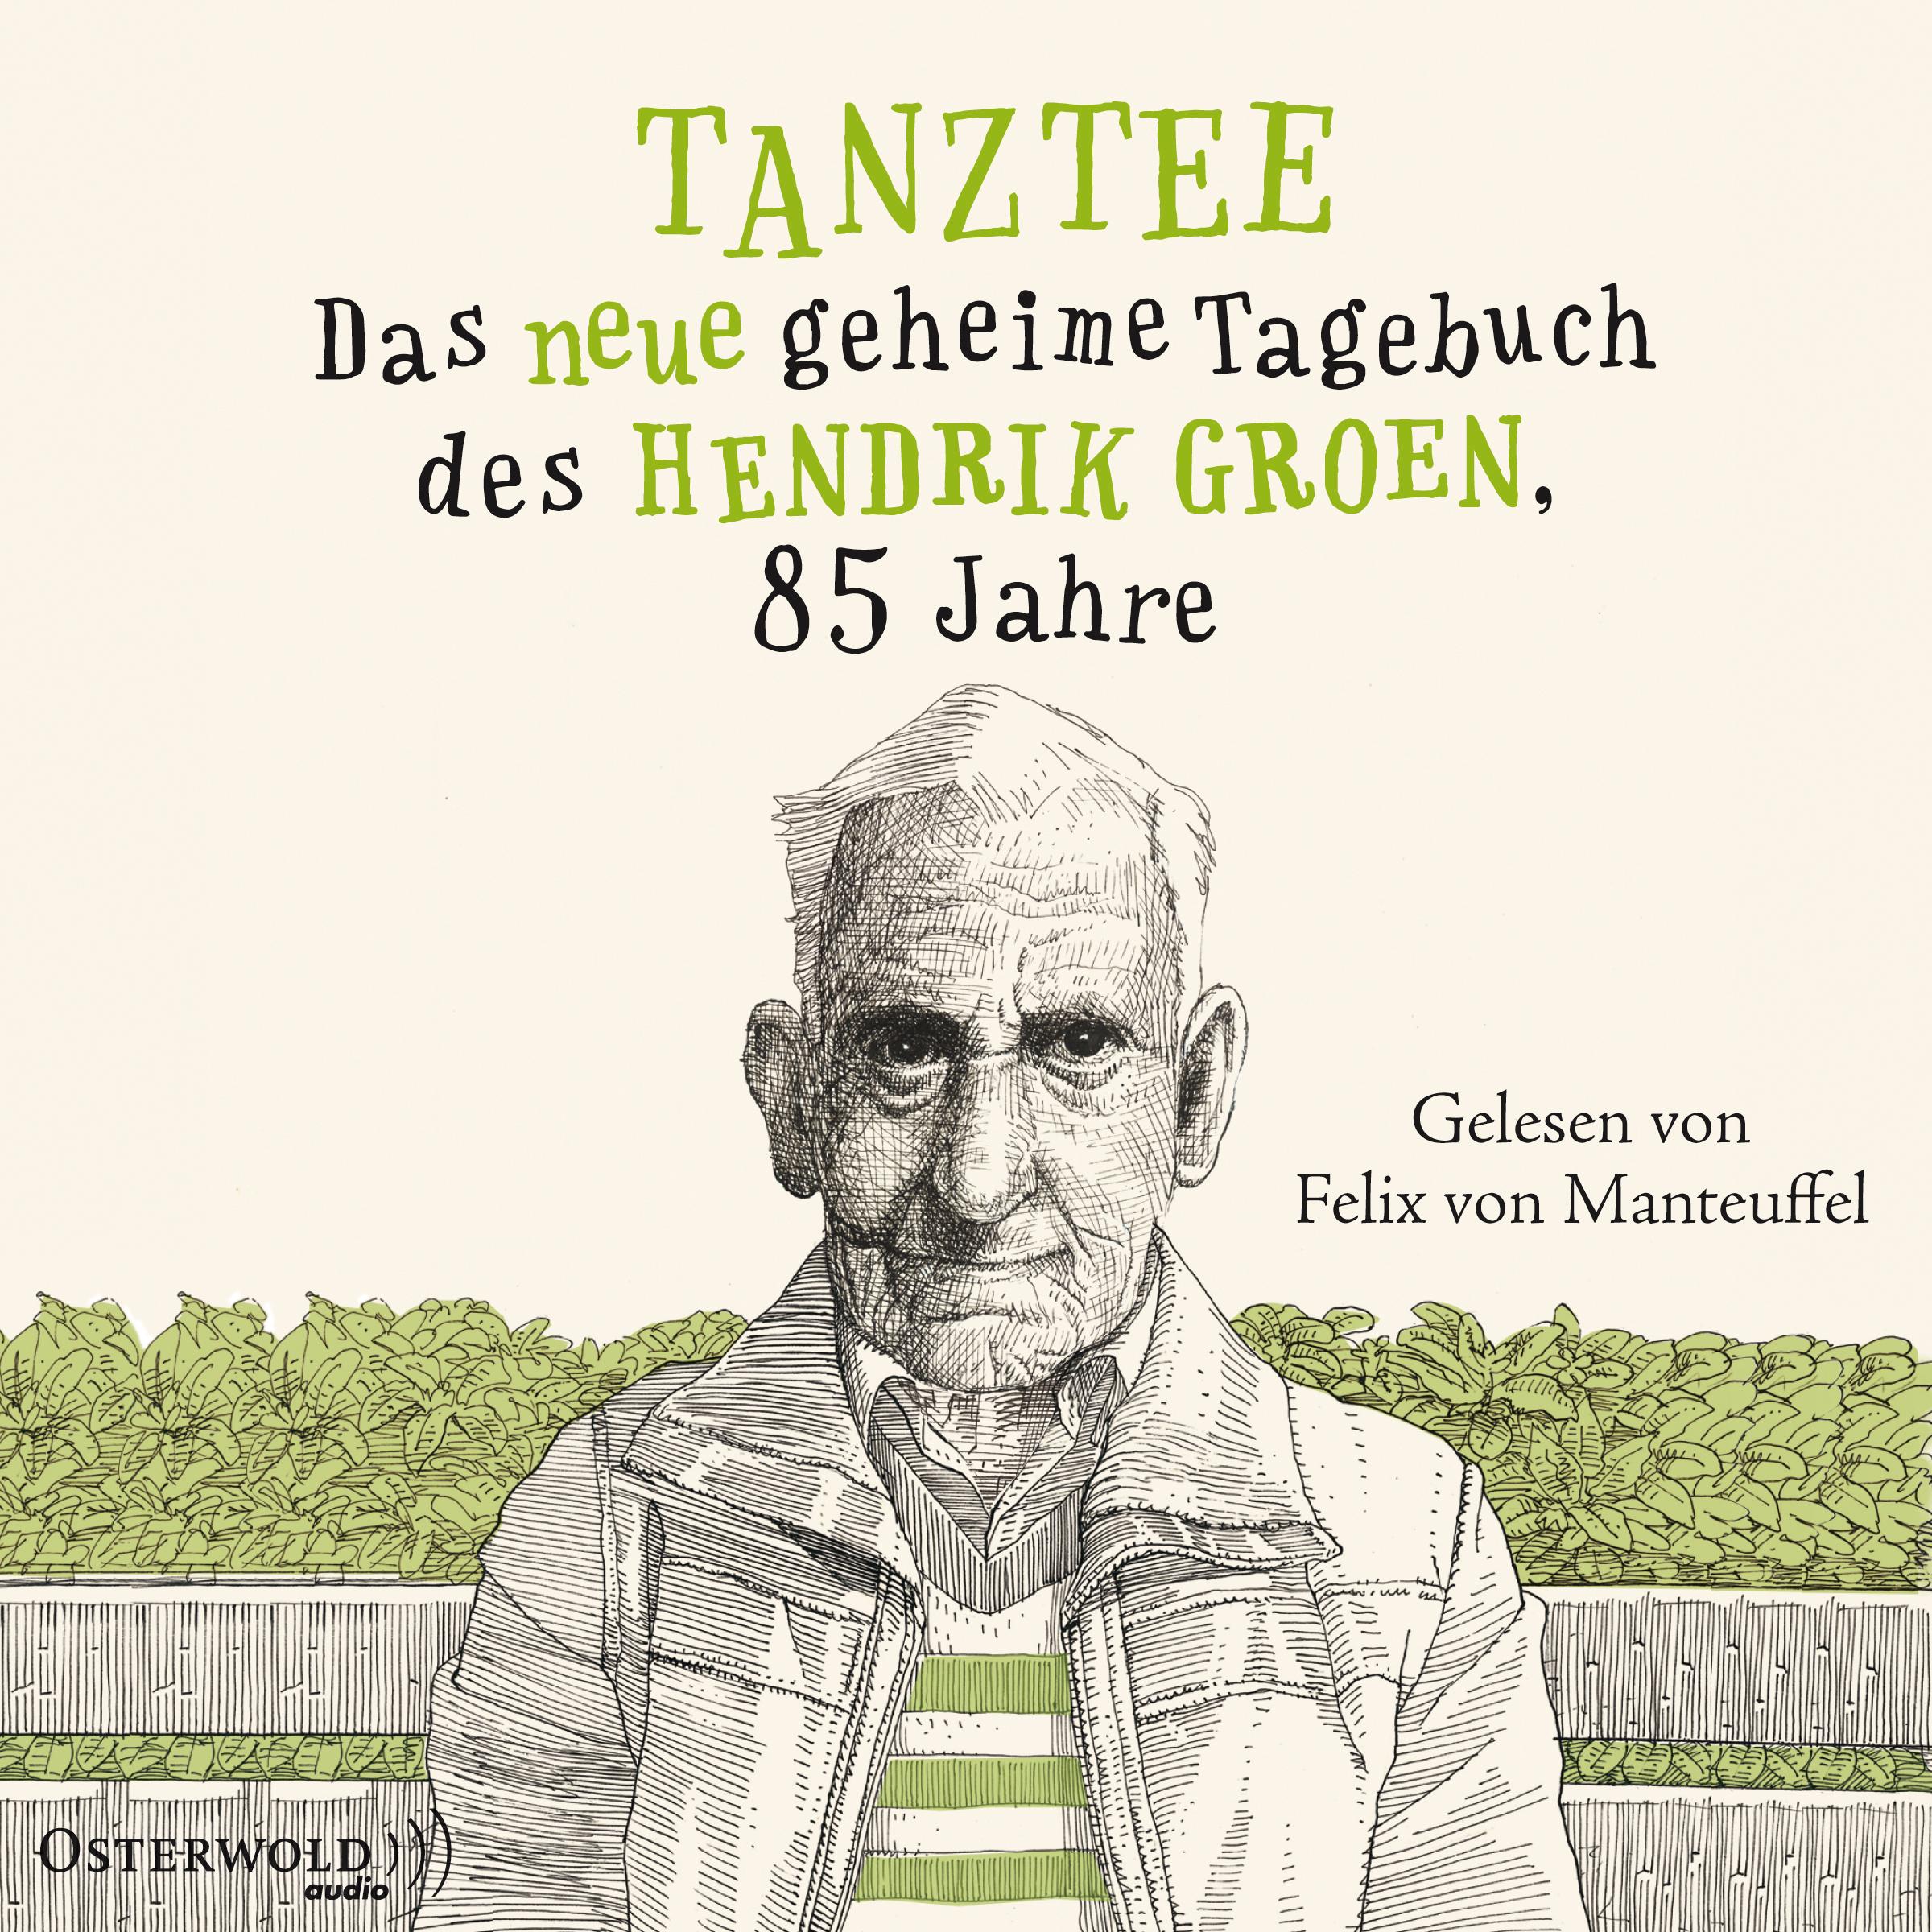 Hörbuch: Groen - Tanztee